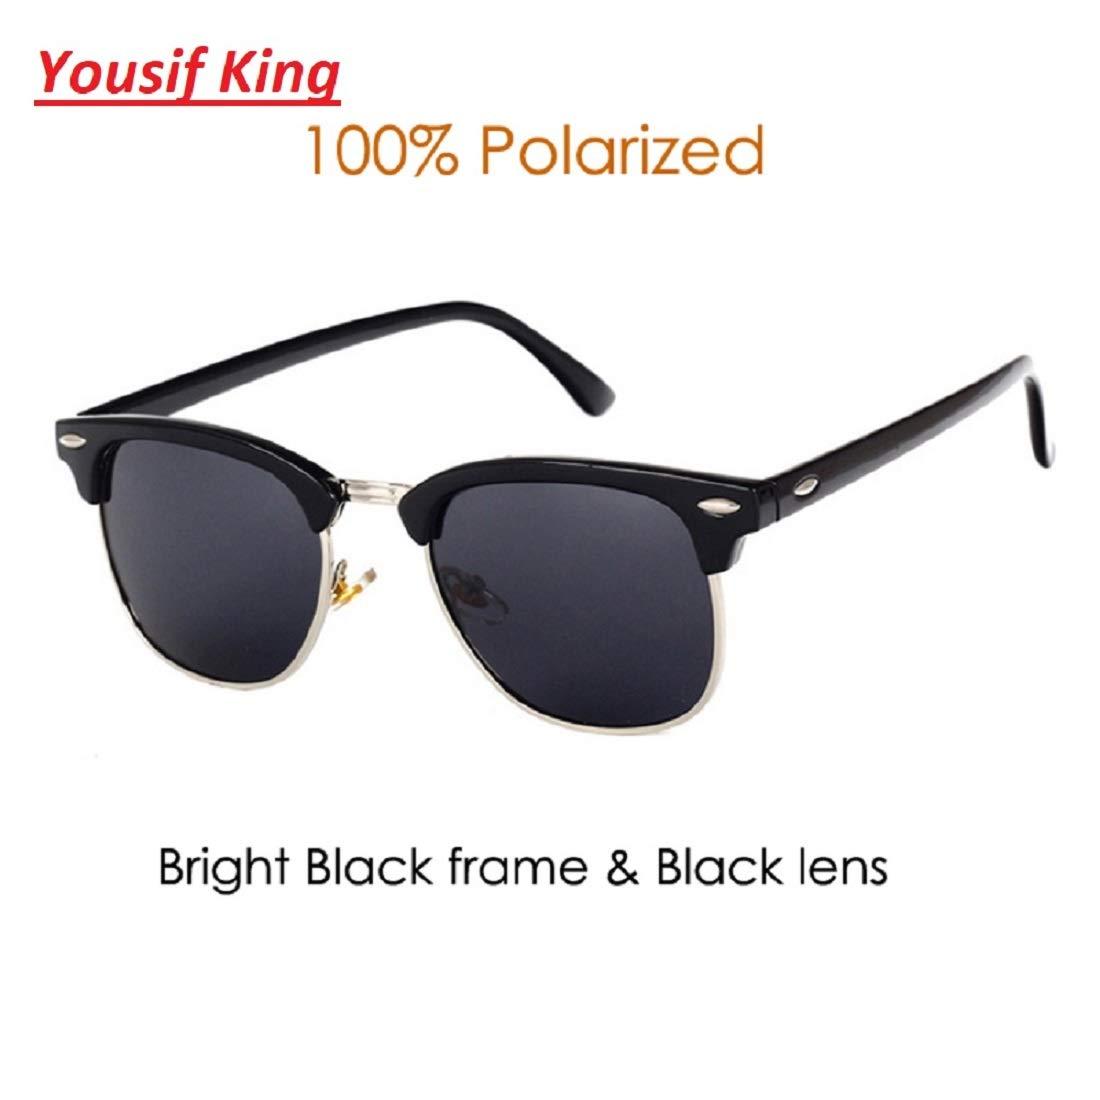 Amazon.com: Yousif King Classic Brand Polarized Sunglasses ...